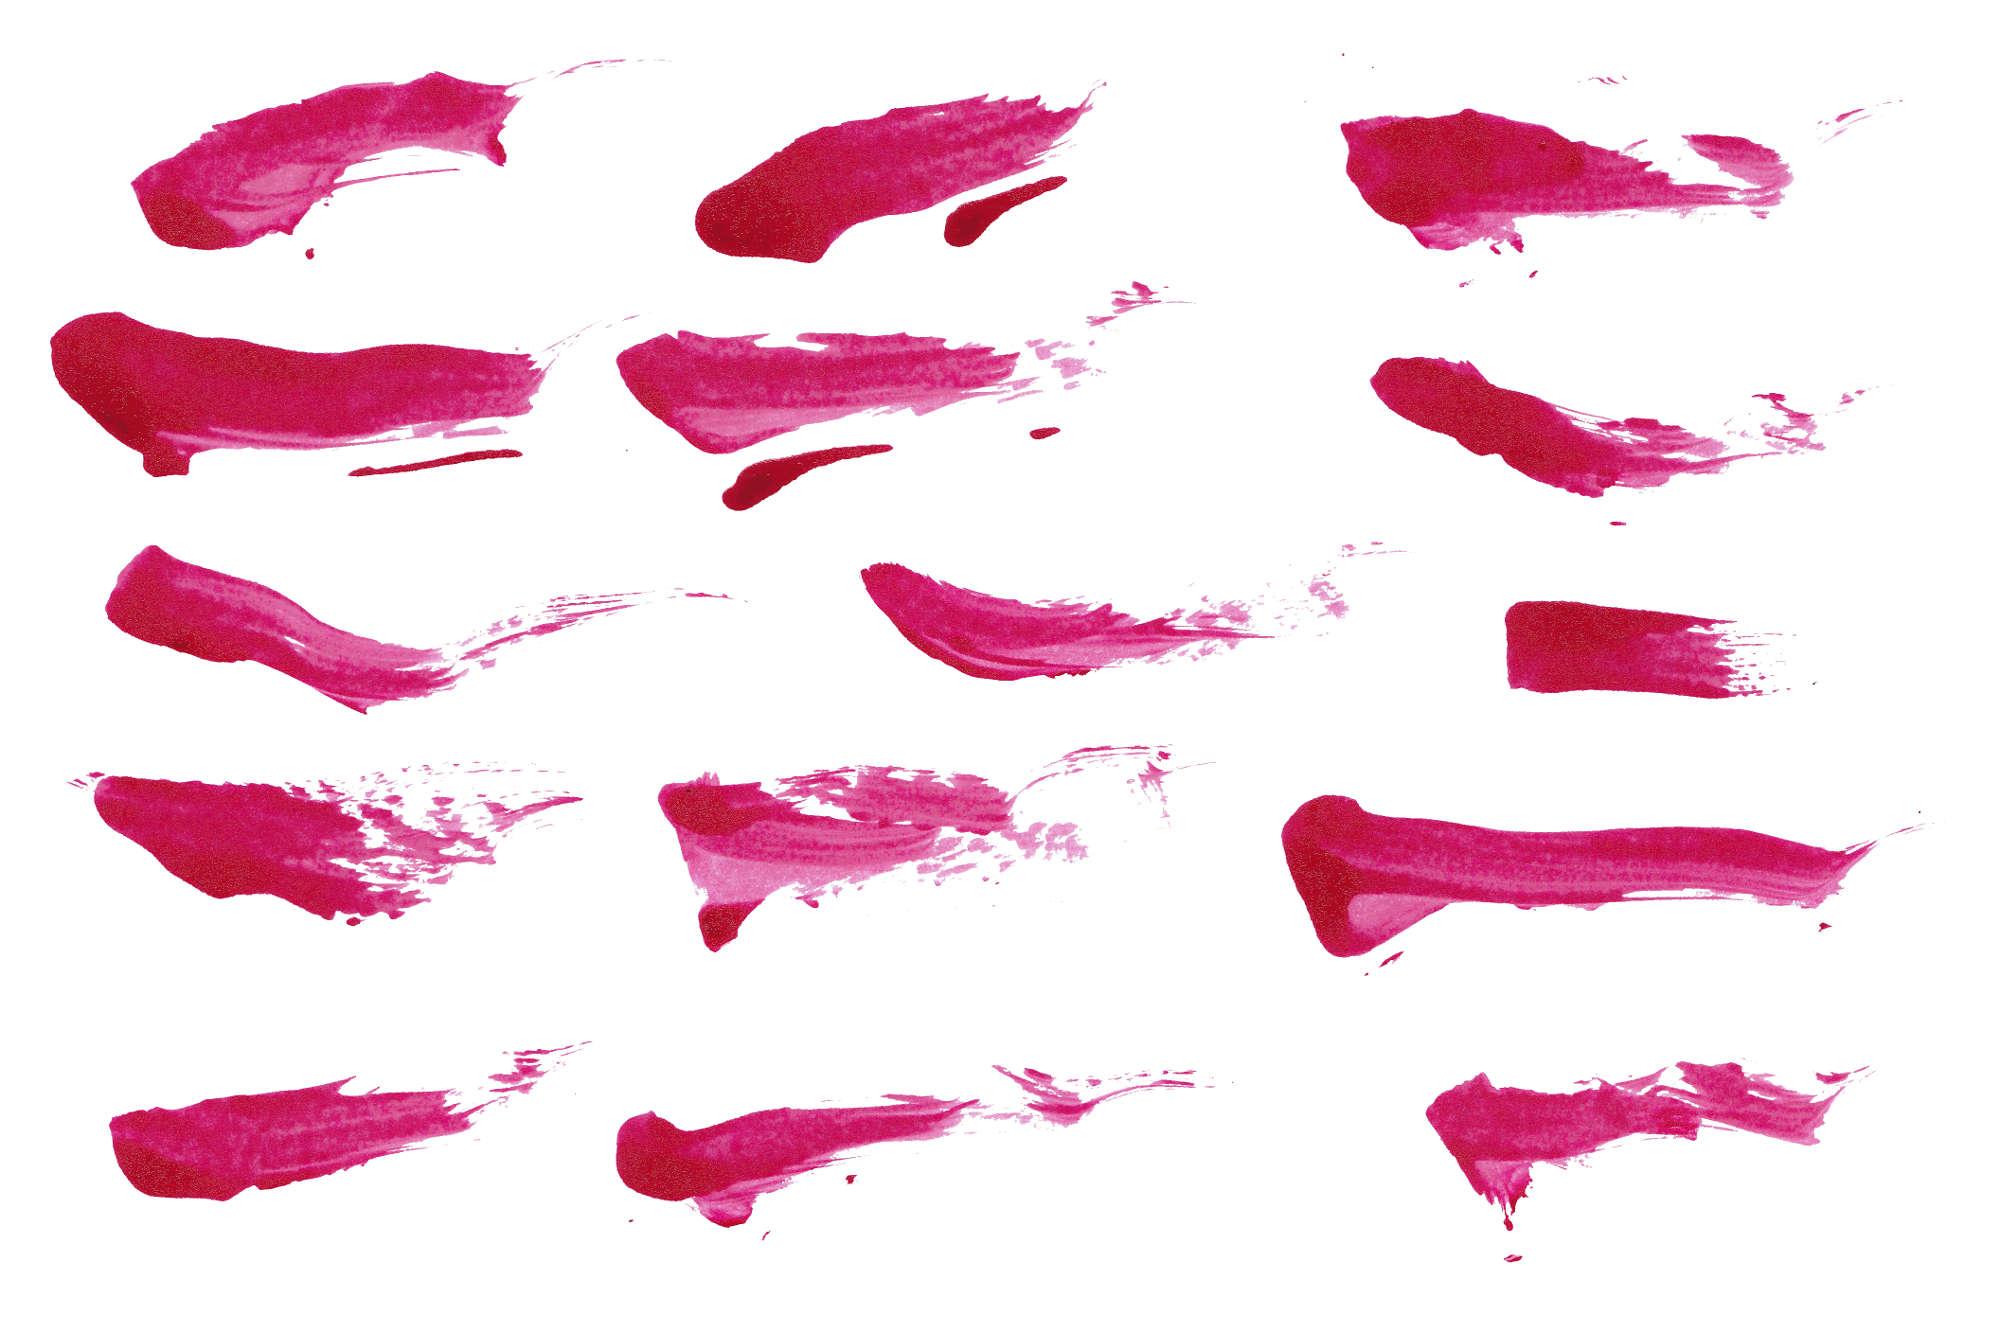 15-red-nail-polish-brush-strokes-cover.jpg